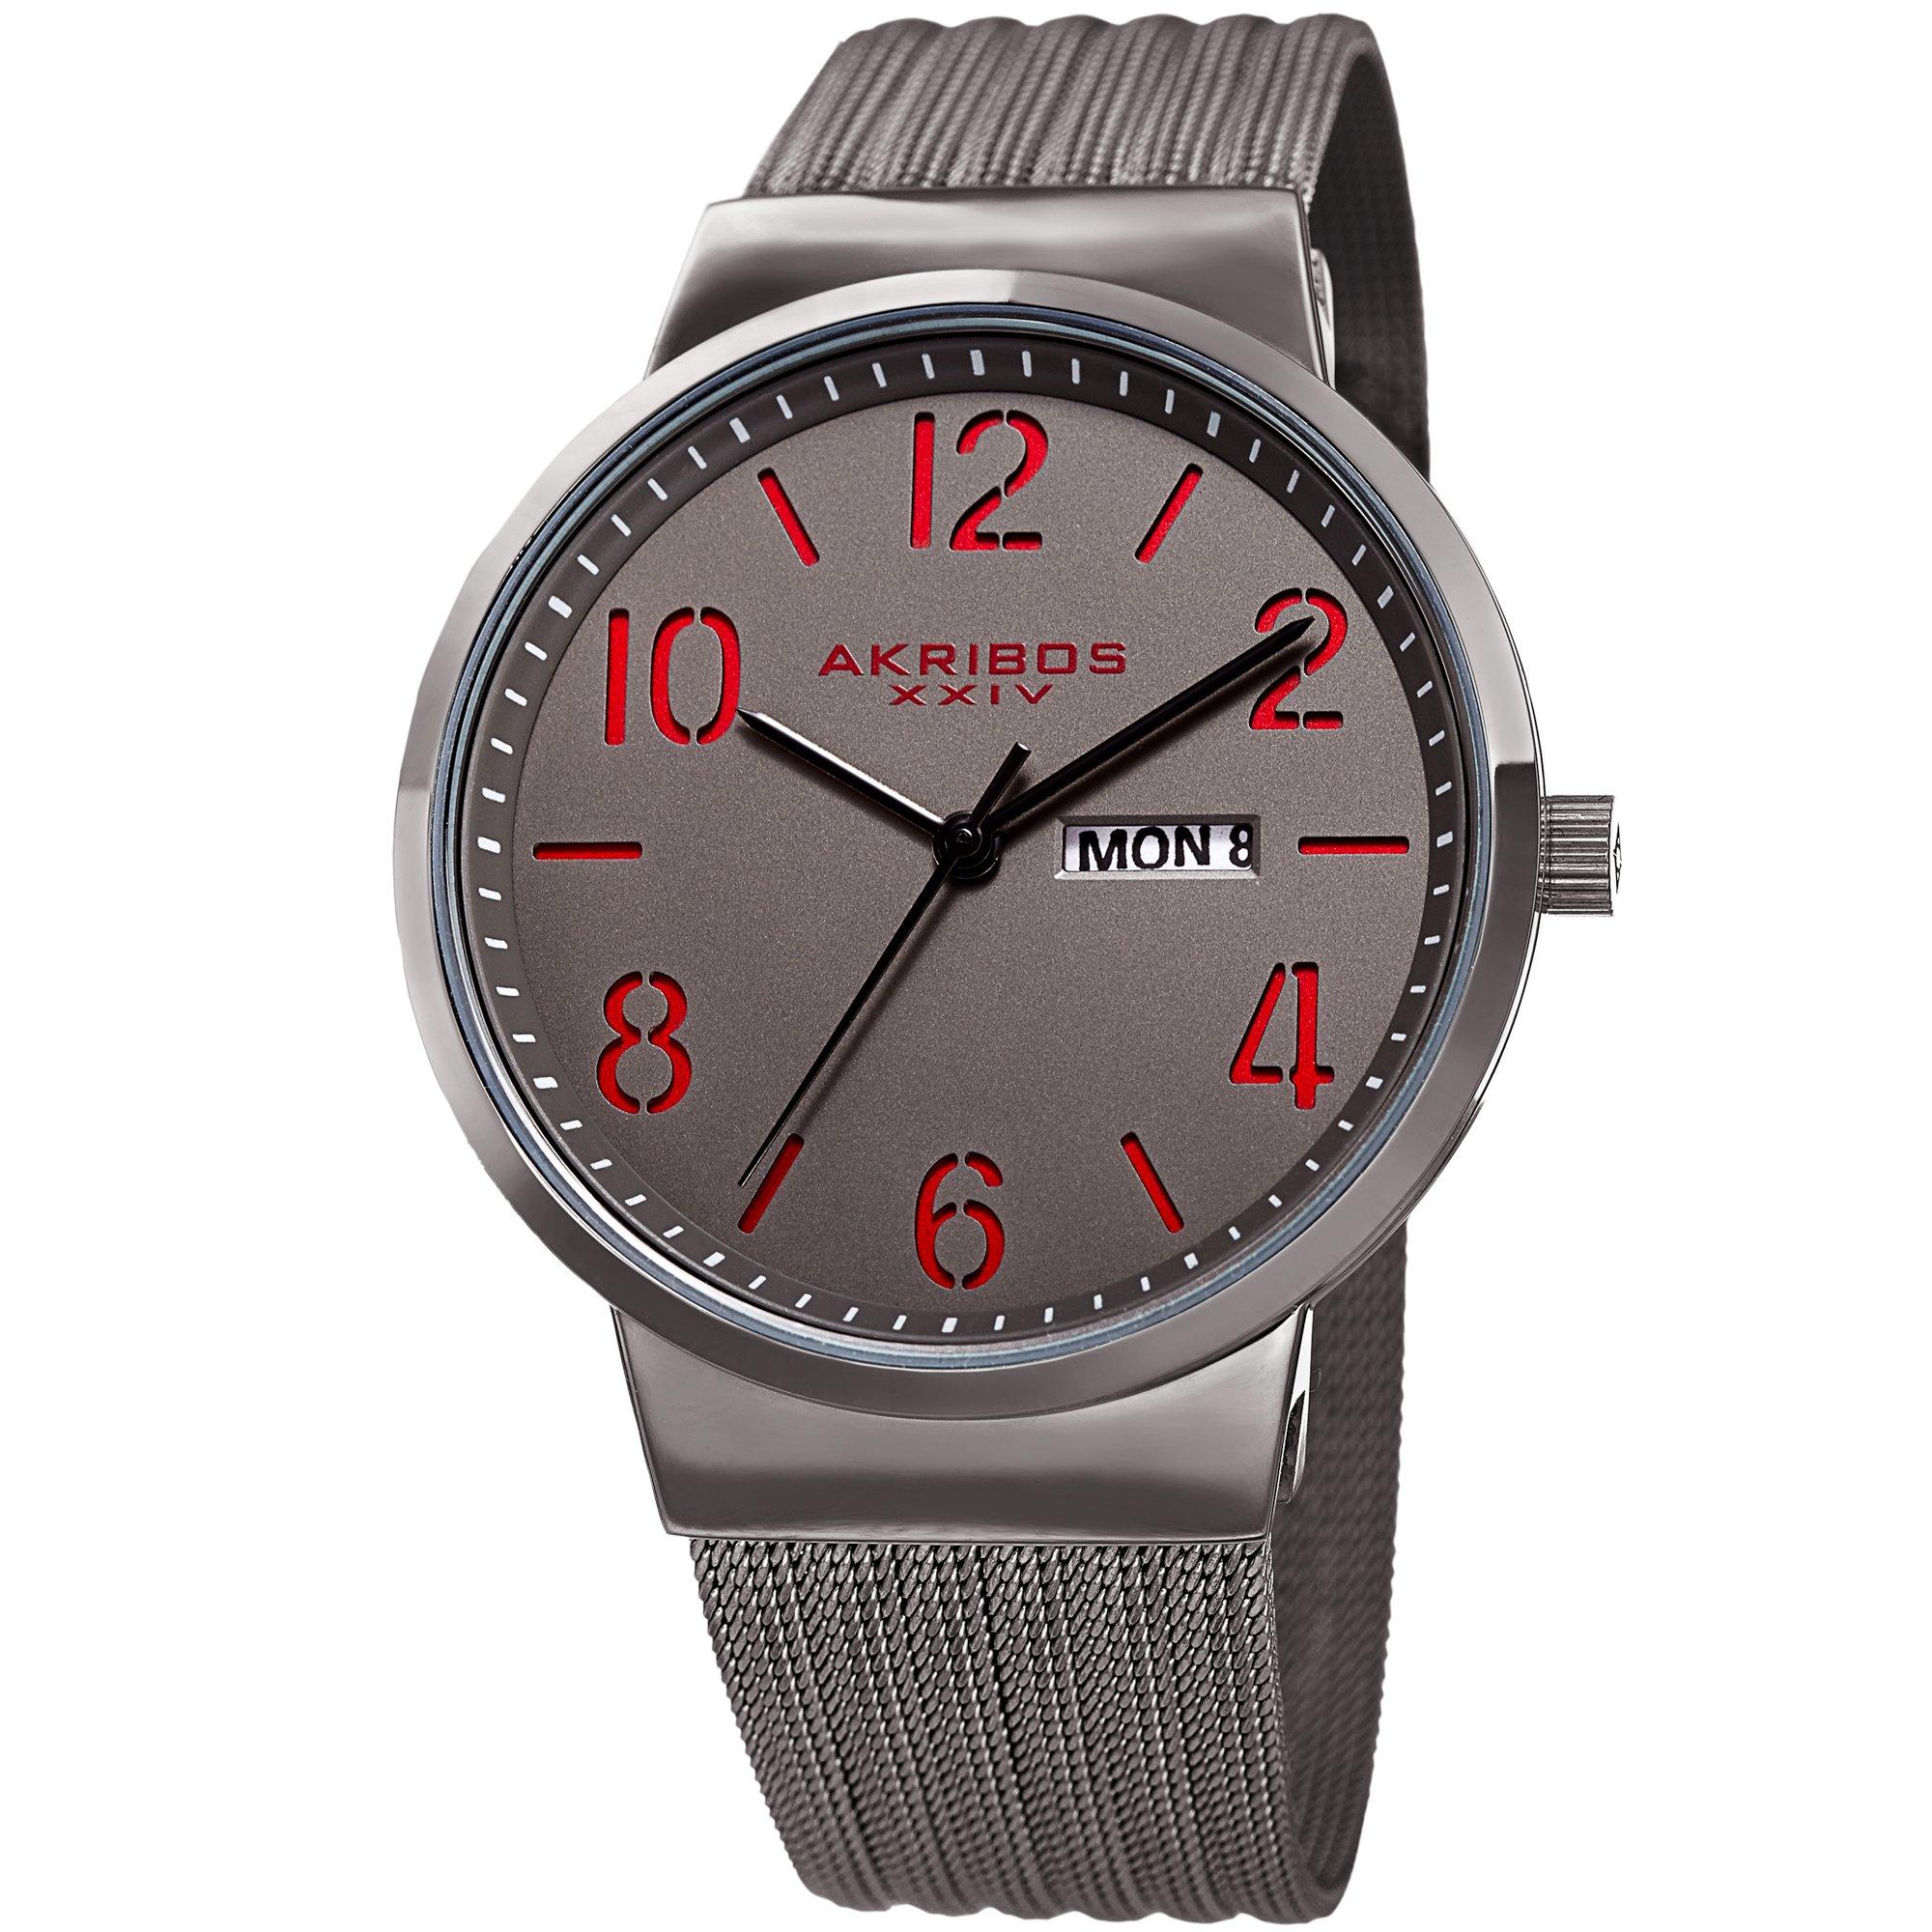 Akribos XXIV Gunmetal Designer Men's Watch – Slim Stainless Steel Fine Mesh Fashion Bracelet Wristwatch – Quartz Movement, Day and Date – AK996GN